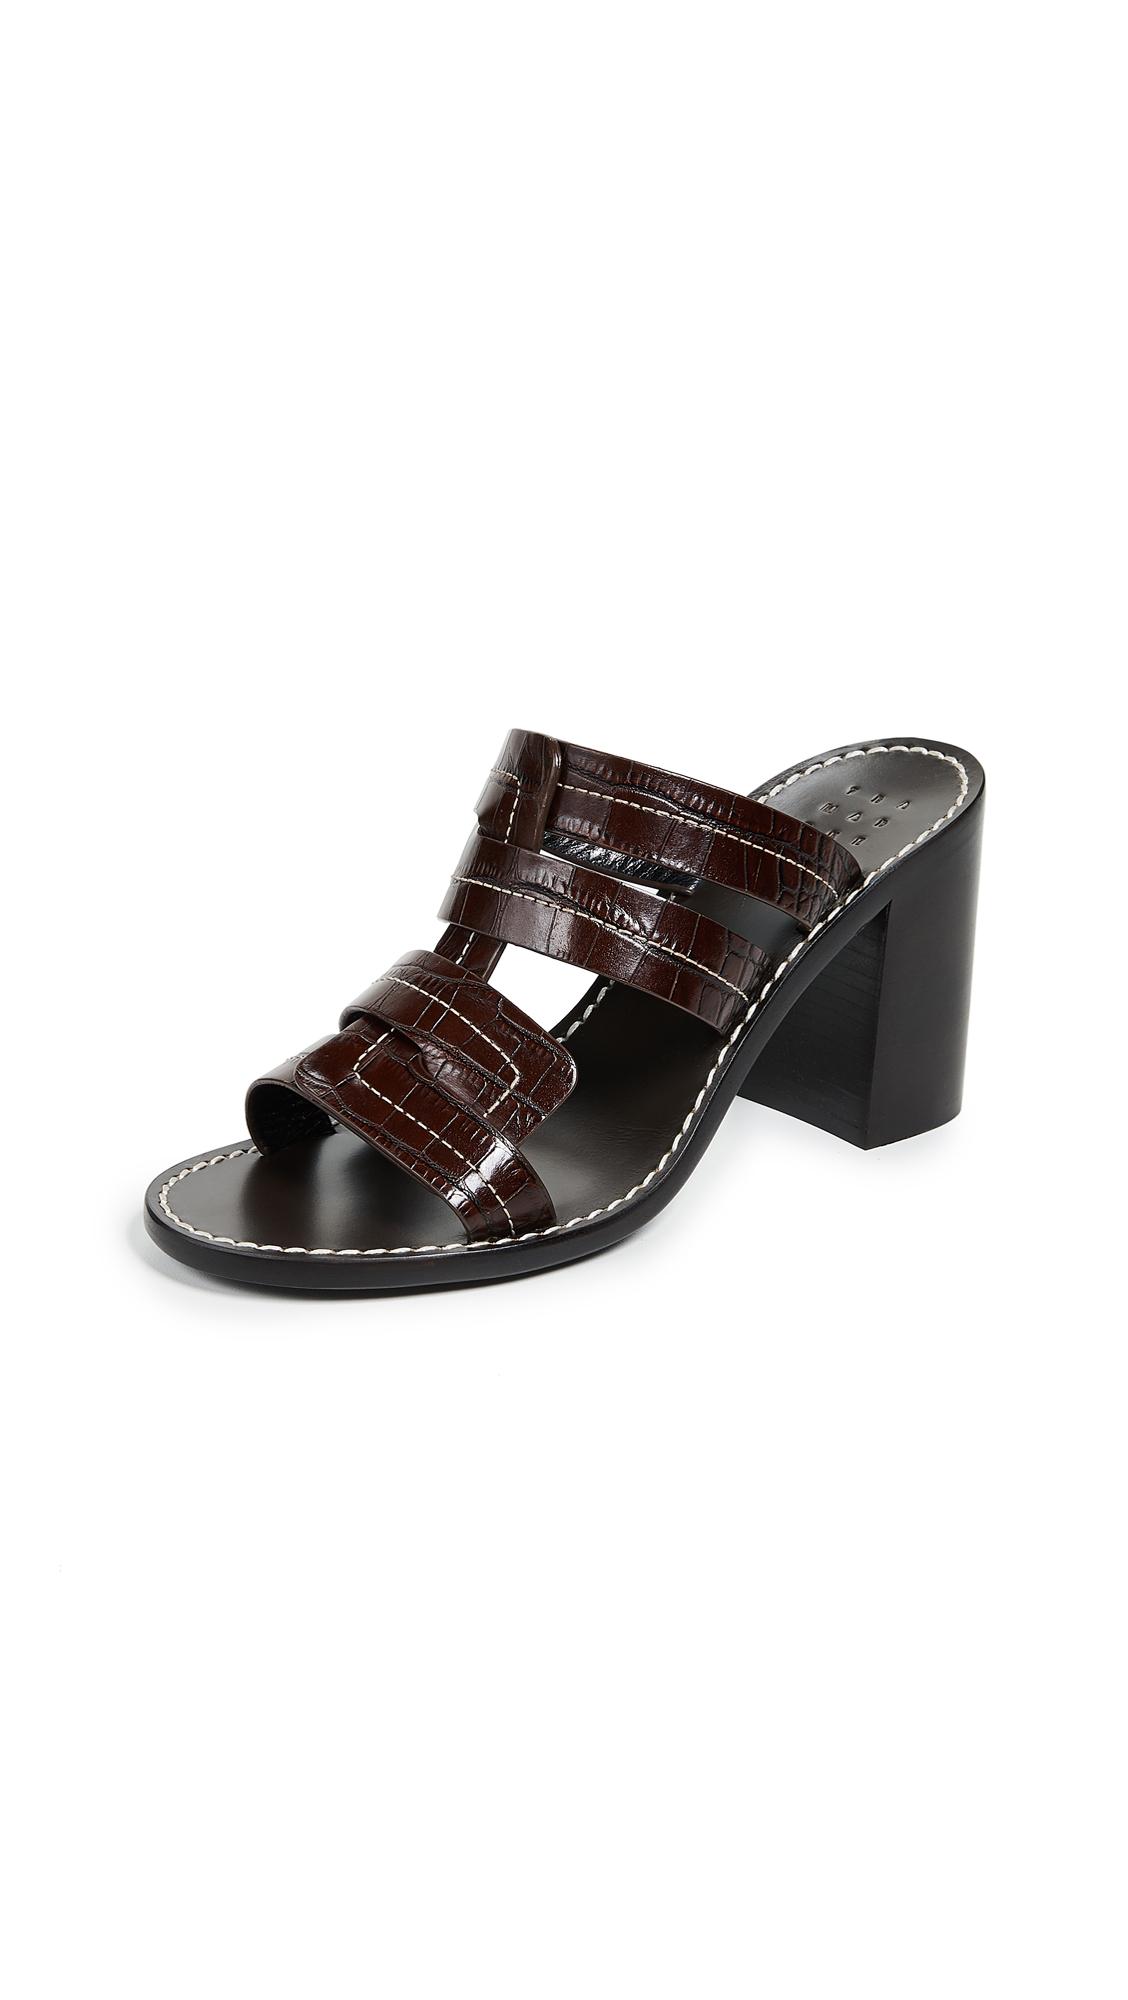 Trademark Interlock Faux Croc Heeled Sandals - Chocolate Brown